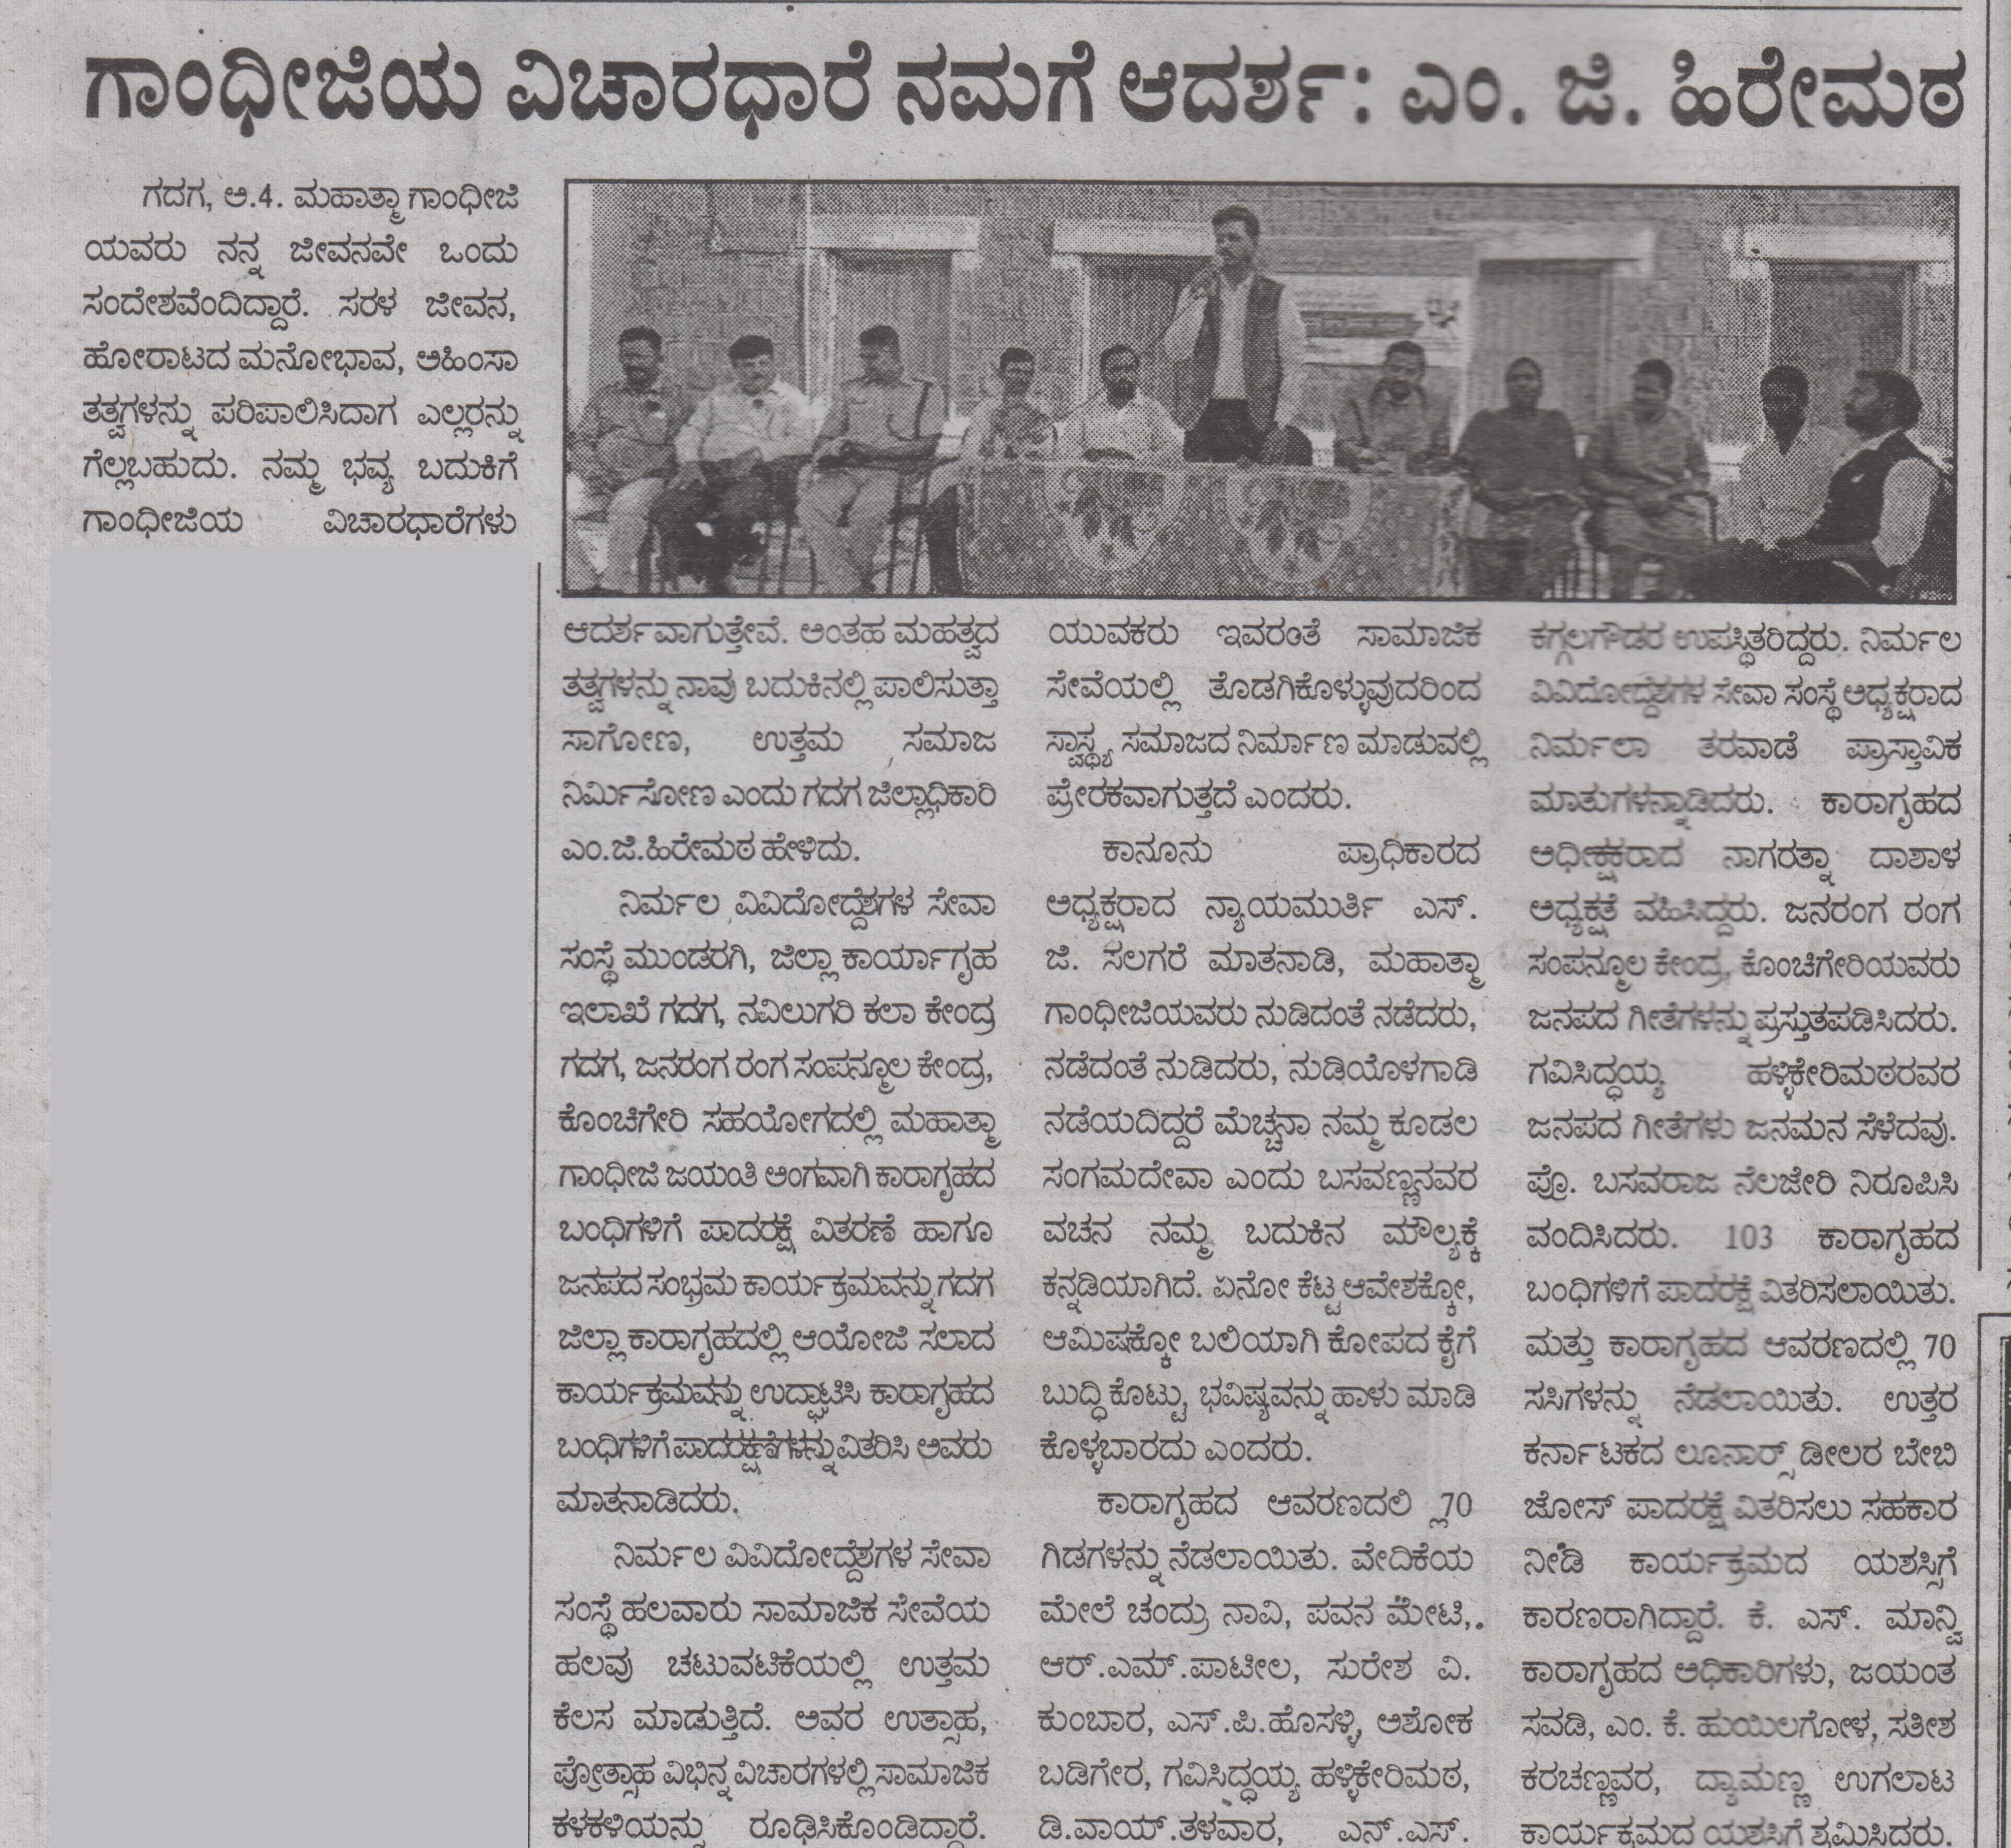 /media/nirmalavss/1NGO-00290-Nirmala_Vivedodeshagala_Seva_Samsthe-Paper_Media_Coverage-7.jpg